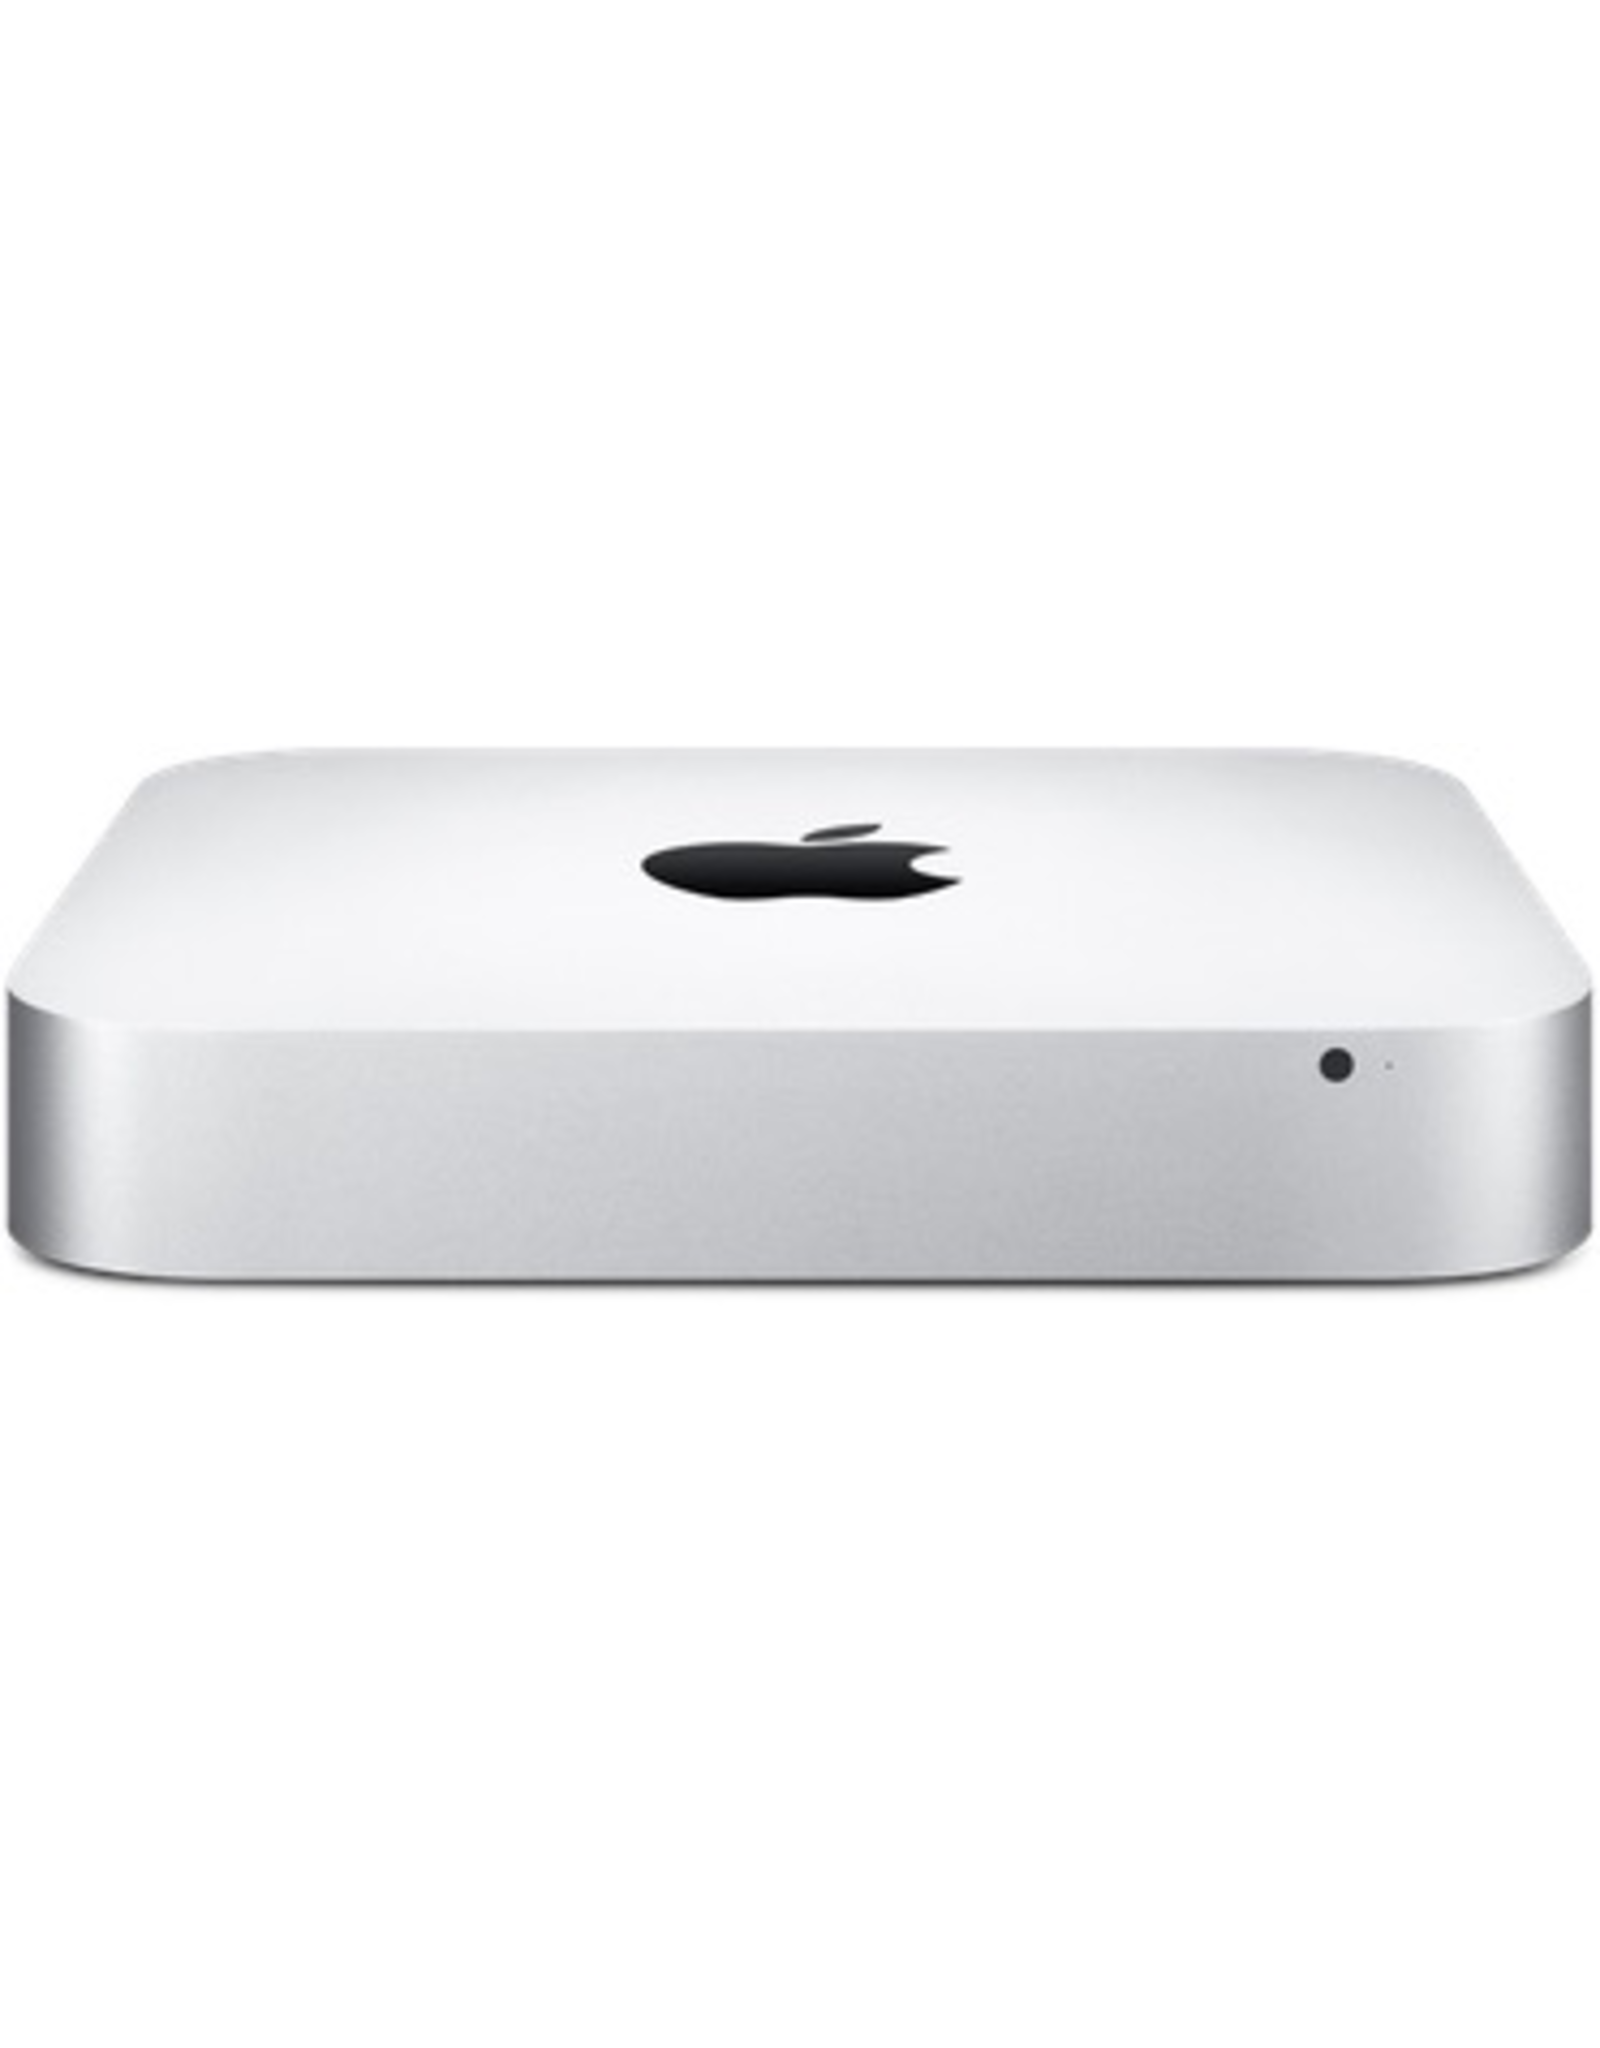 Apple Mac mini (Late 2014) - 2.6 GHz i5 / 8 GB 1600 MHz / 250 GB / SSD / 30 Day Exchange